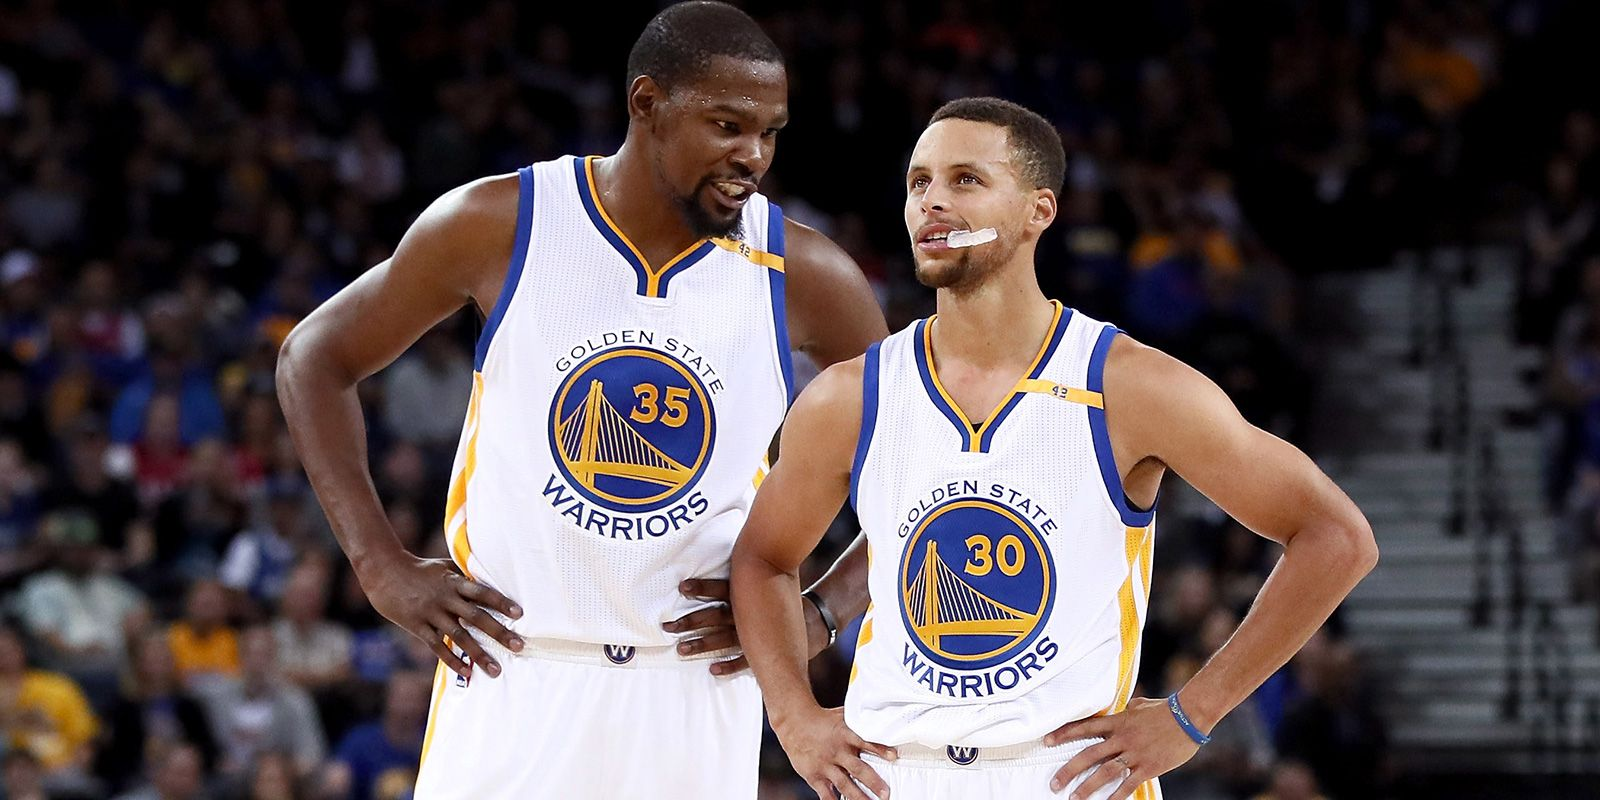 Curry:為KD加盟籃網感到高興,和他一樣對外界壓力有同感,會永遠記得這3年!-Haters-黑特籃球NBA新聞影音圖片分享社區